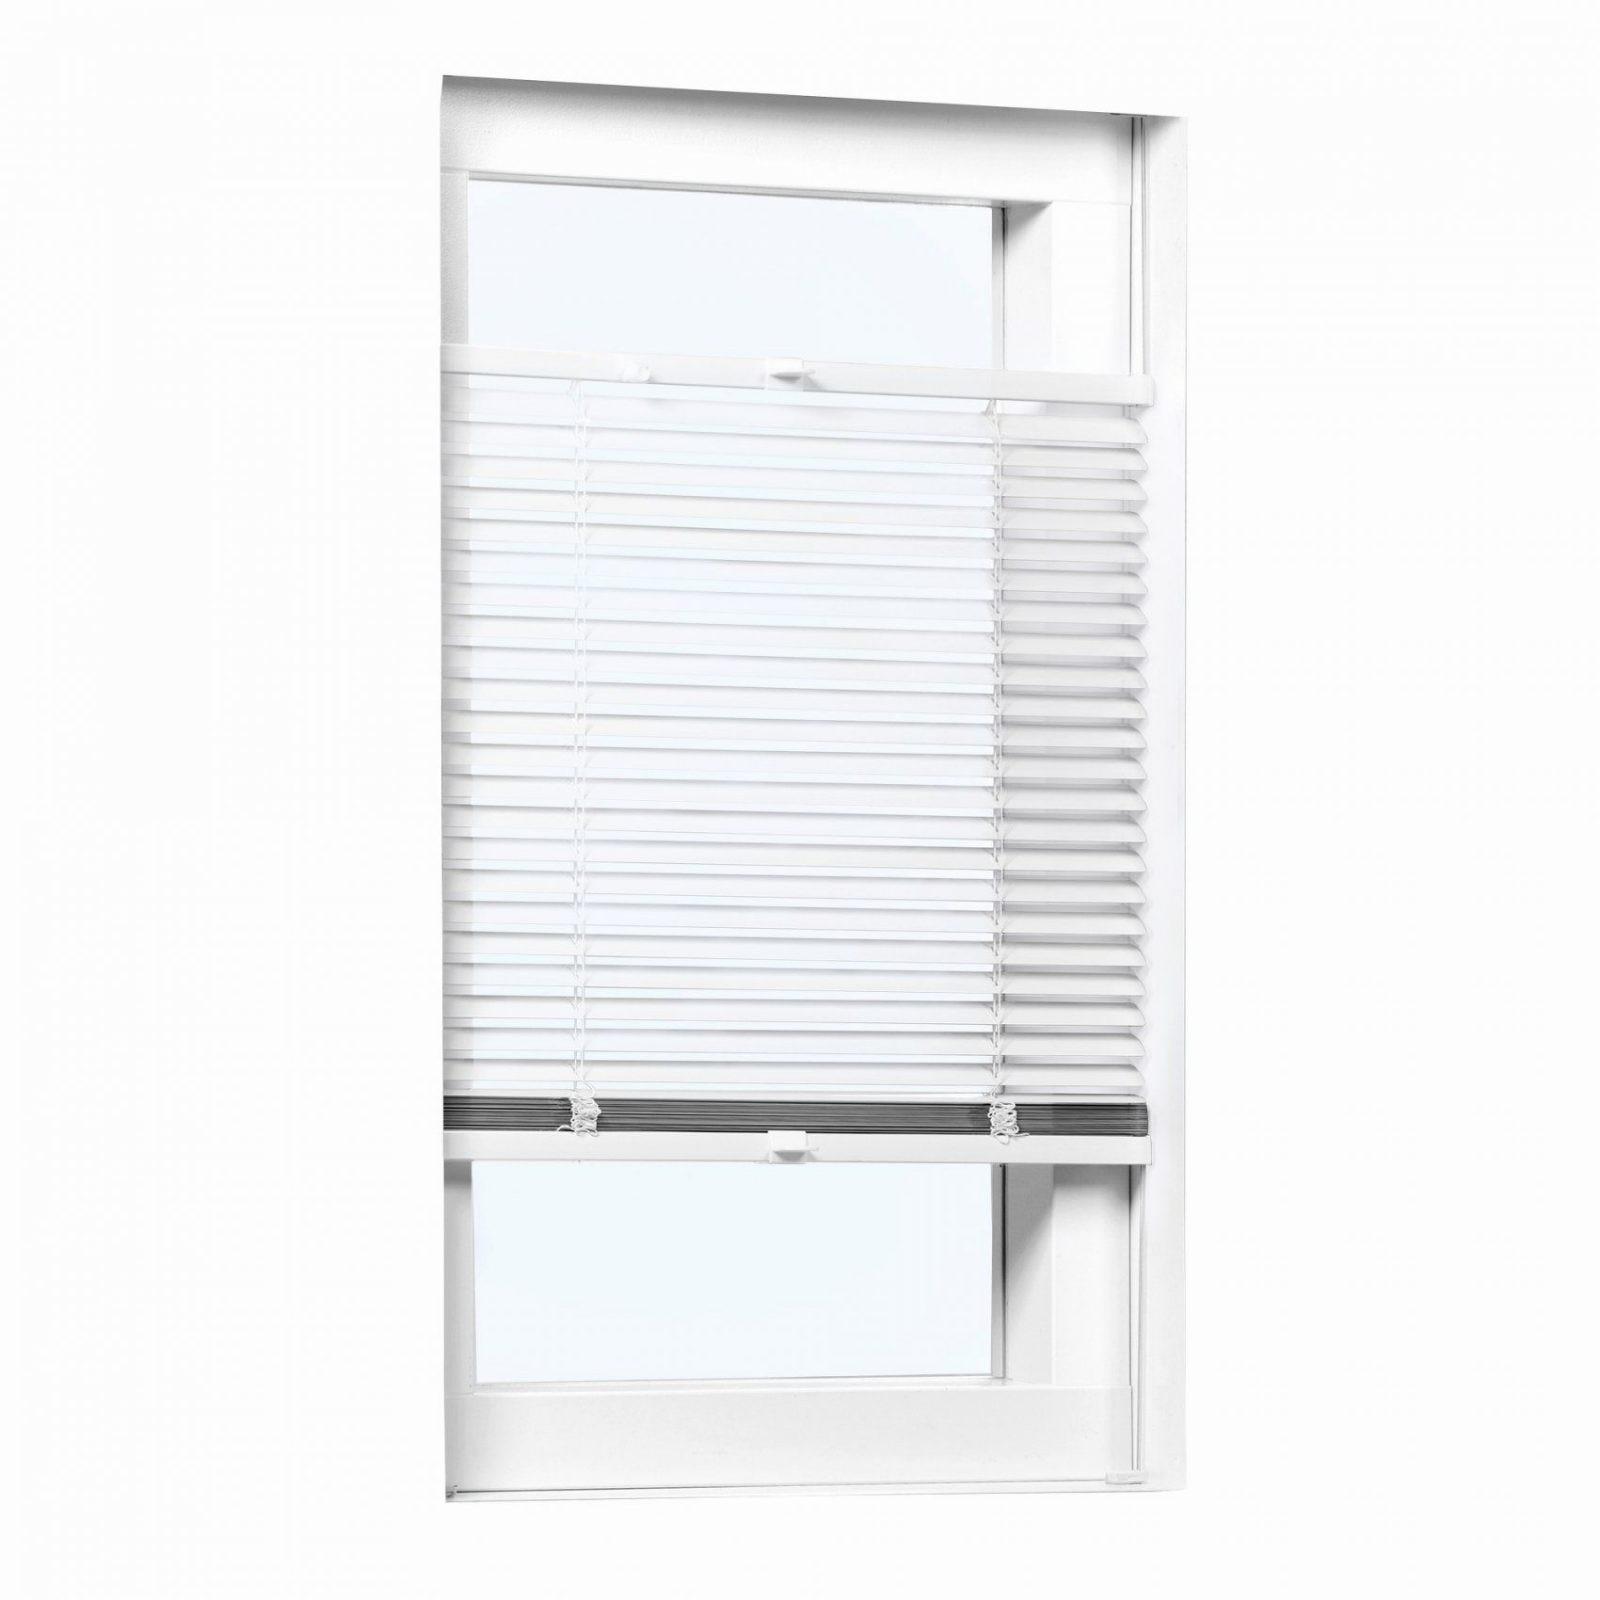 Rollos Ohne Bohren Günstig Lovely Fenster Jalousie  Home Plan von Rollos Ohne Bohren Günstig Bild